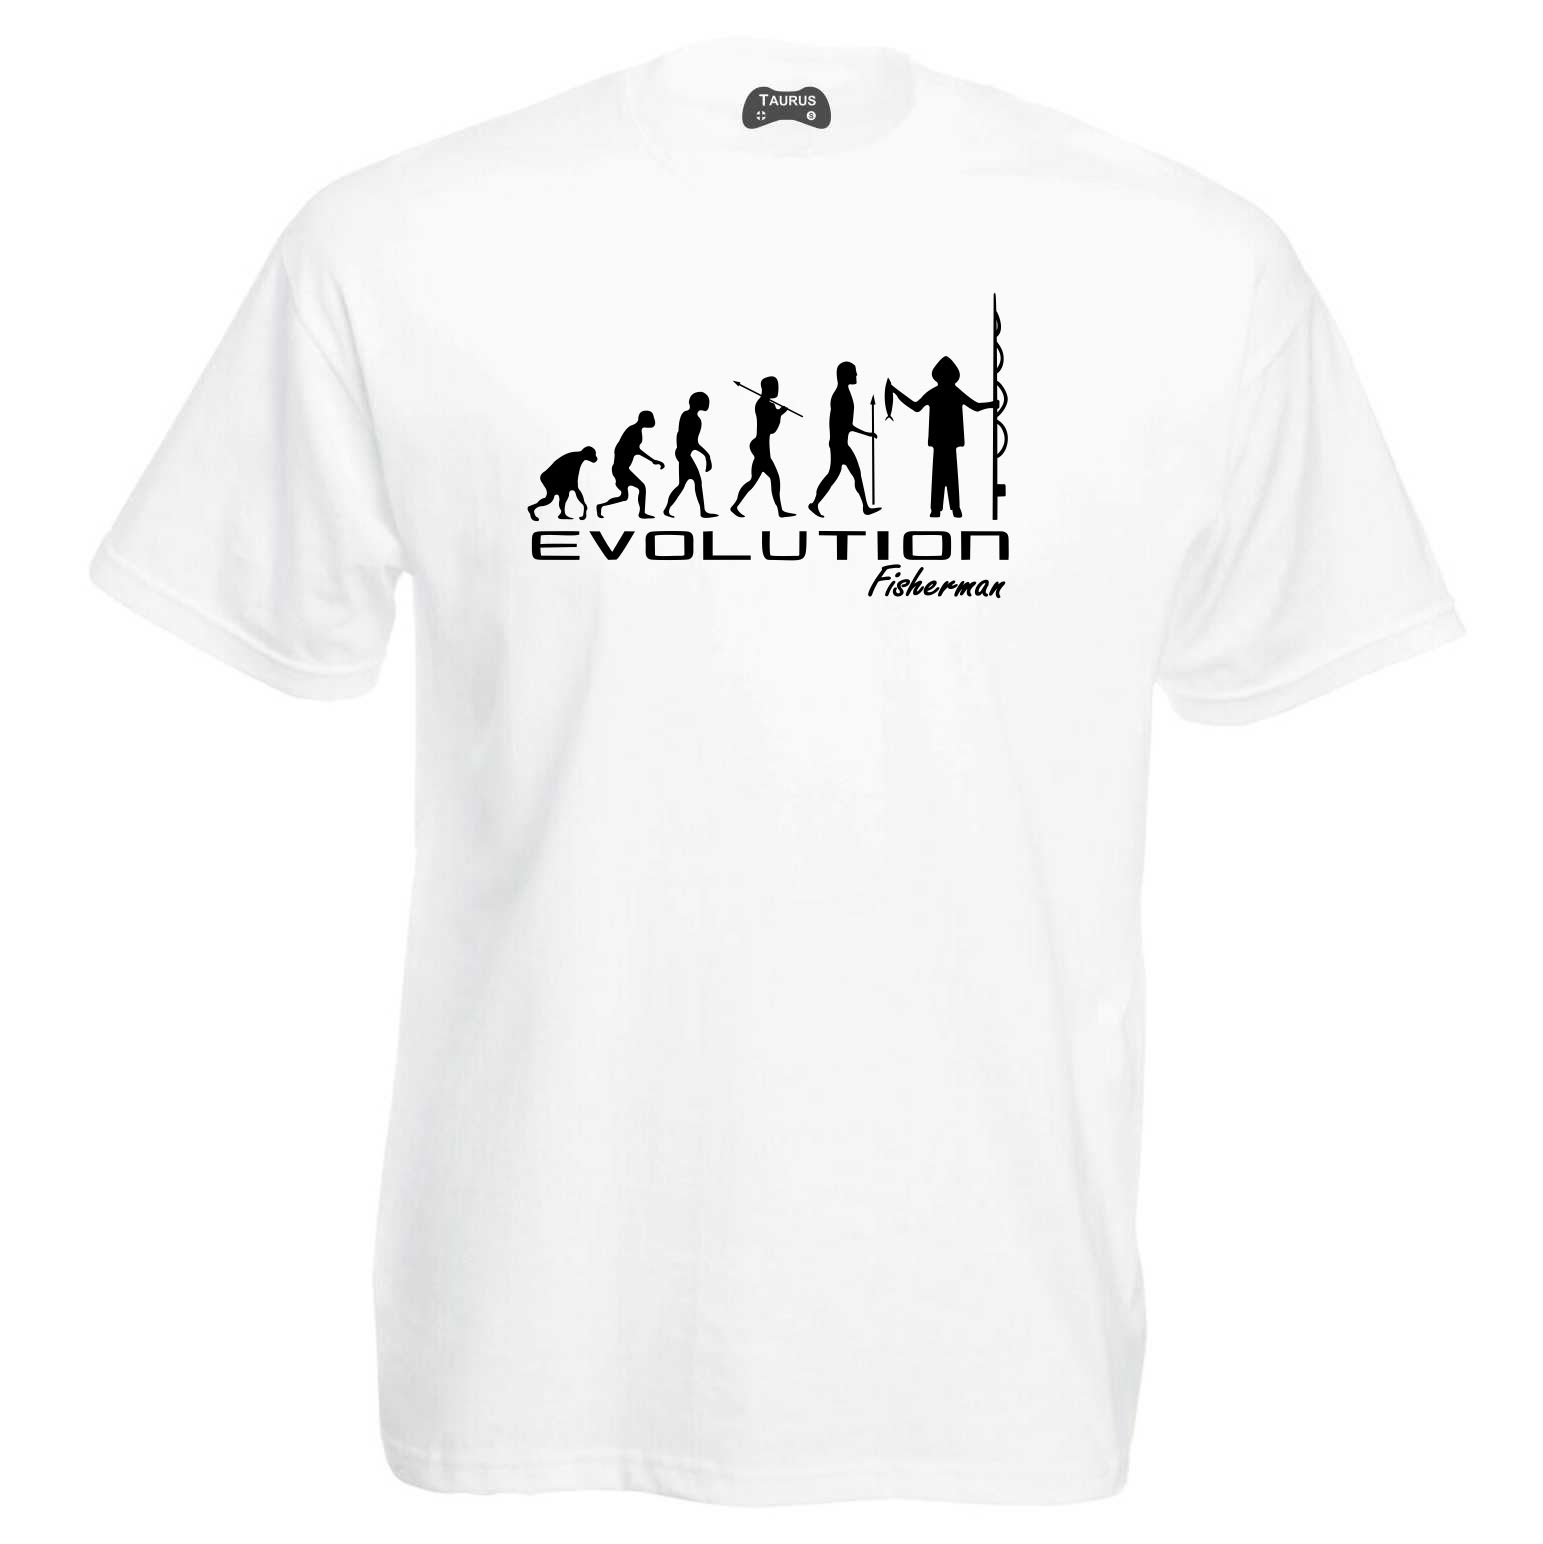 Evolution Of Fisherman T-Shirt